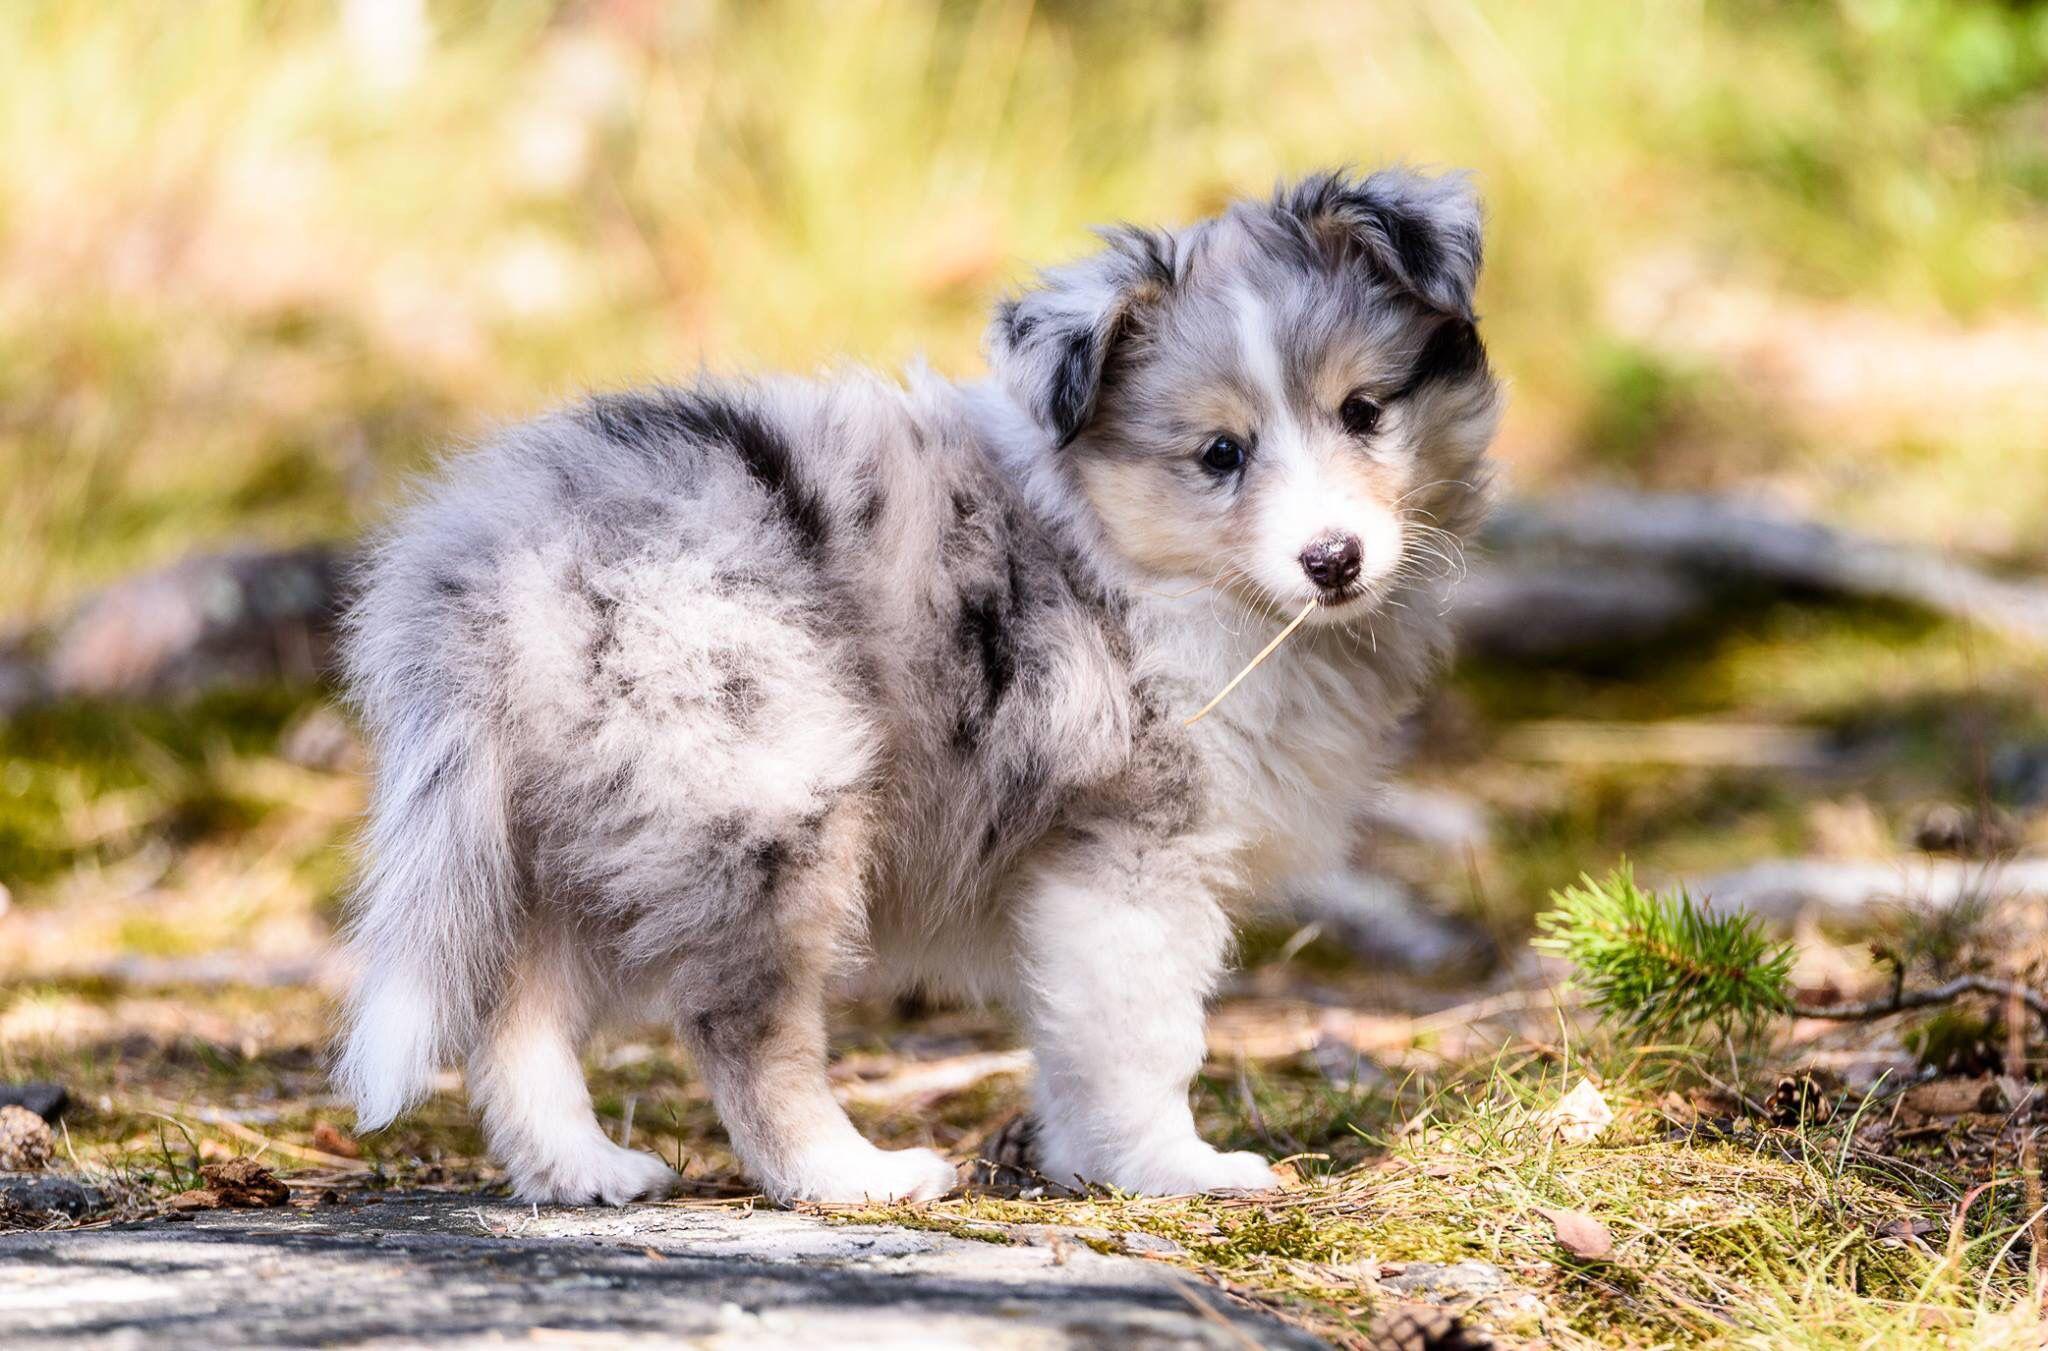 Blue Merle puppy (With images) Shetland sheepdog